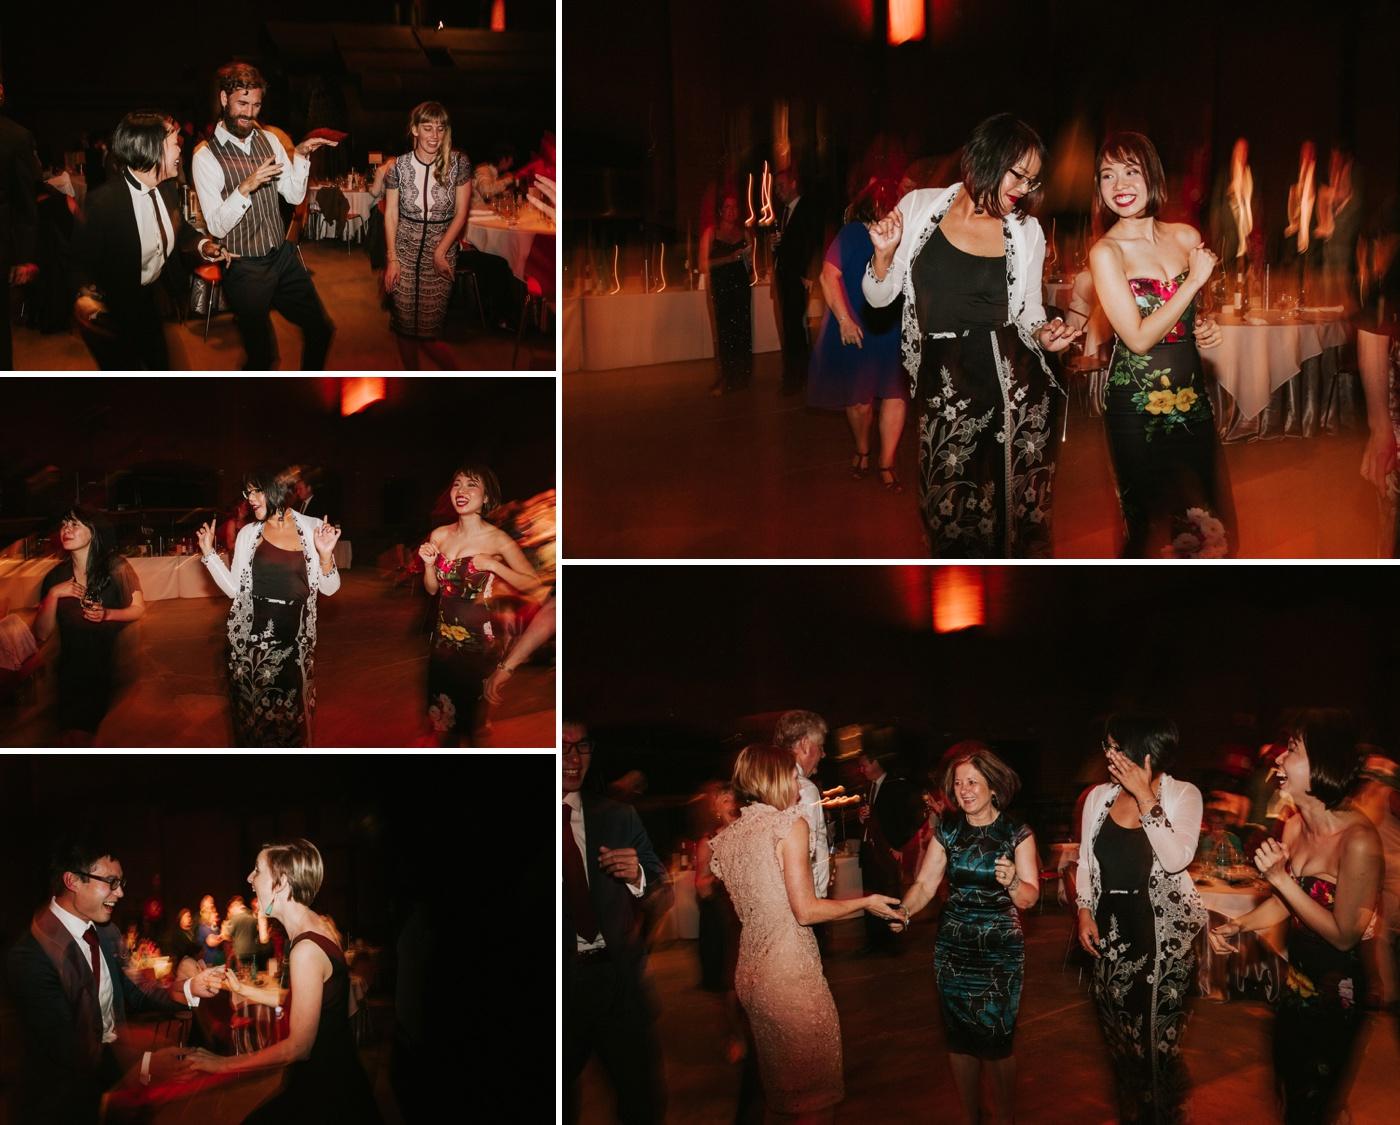 anitadaniel_melbourne-scienceworks-relaxed-fun-geek-wedding_melbourne-candid-wedding-photography_93